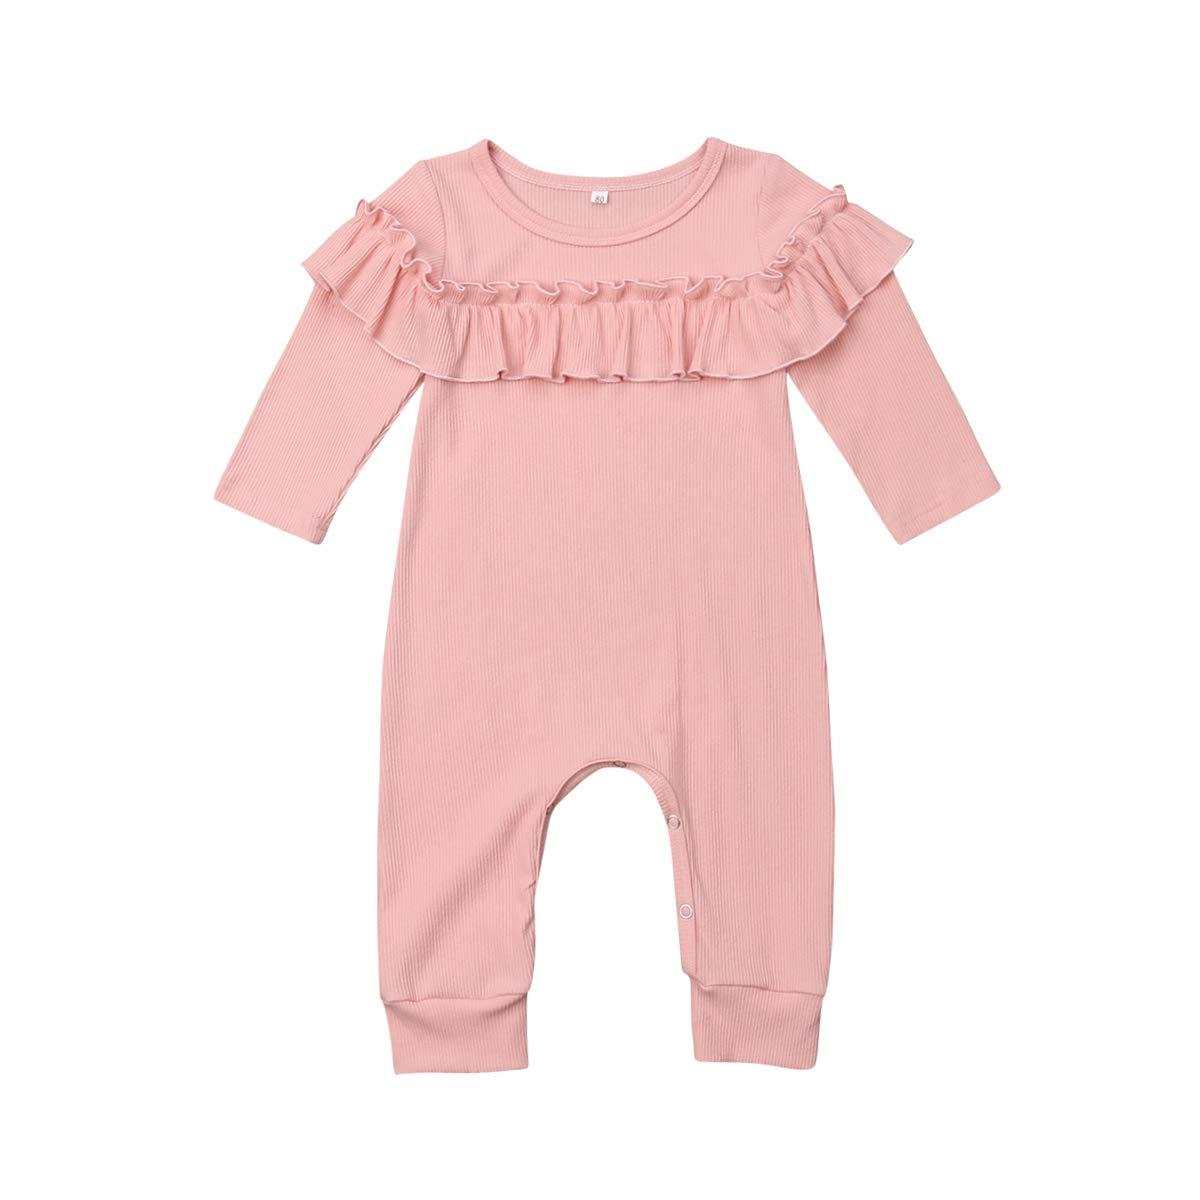 b6d6f590a Amazon.com  Newborn Infant Baby Girl Ruffle Long Sleeve Pink Romper ...